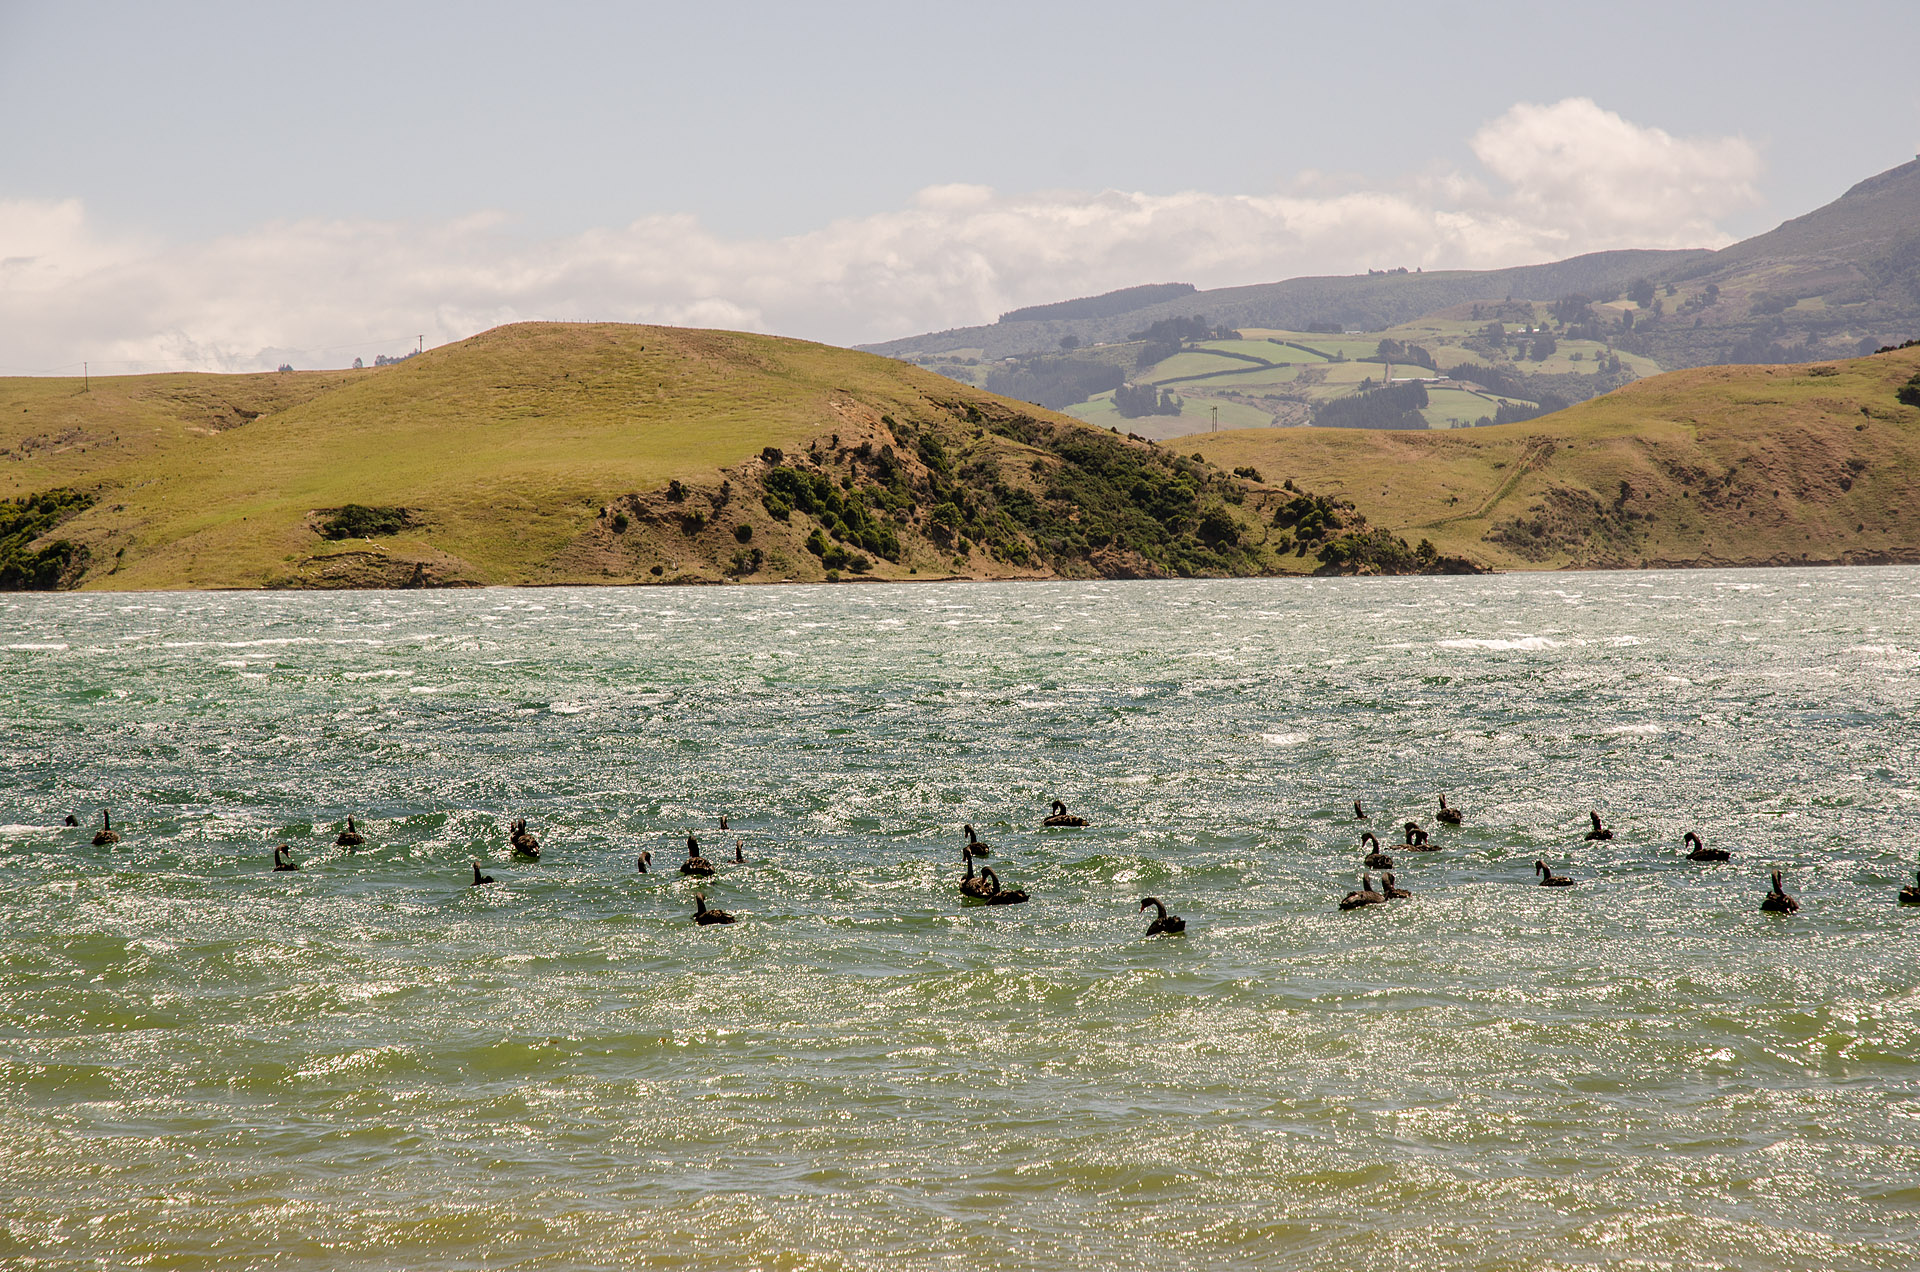 Black Swans (Otago Peninsula)